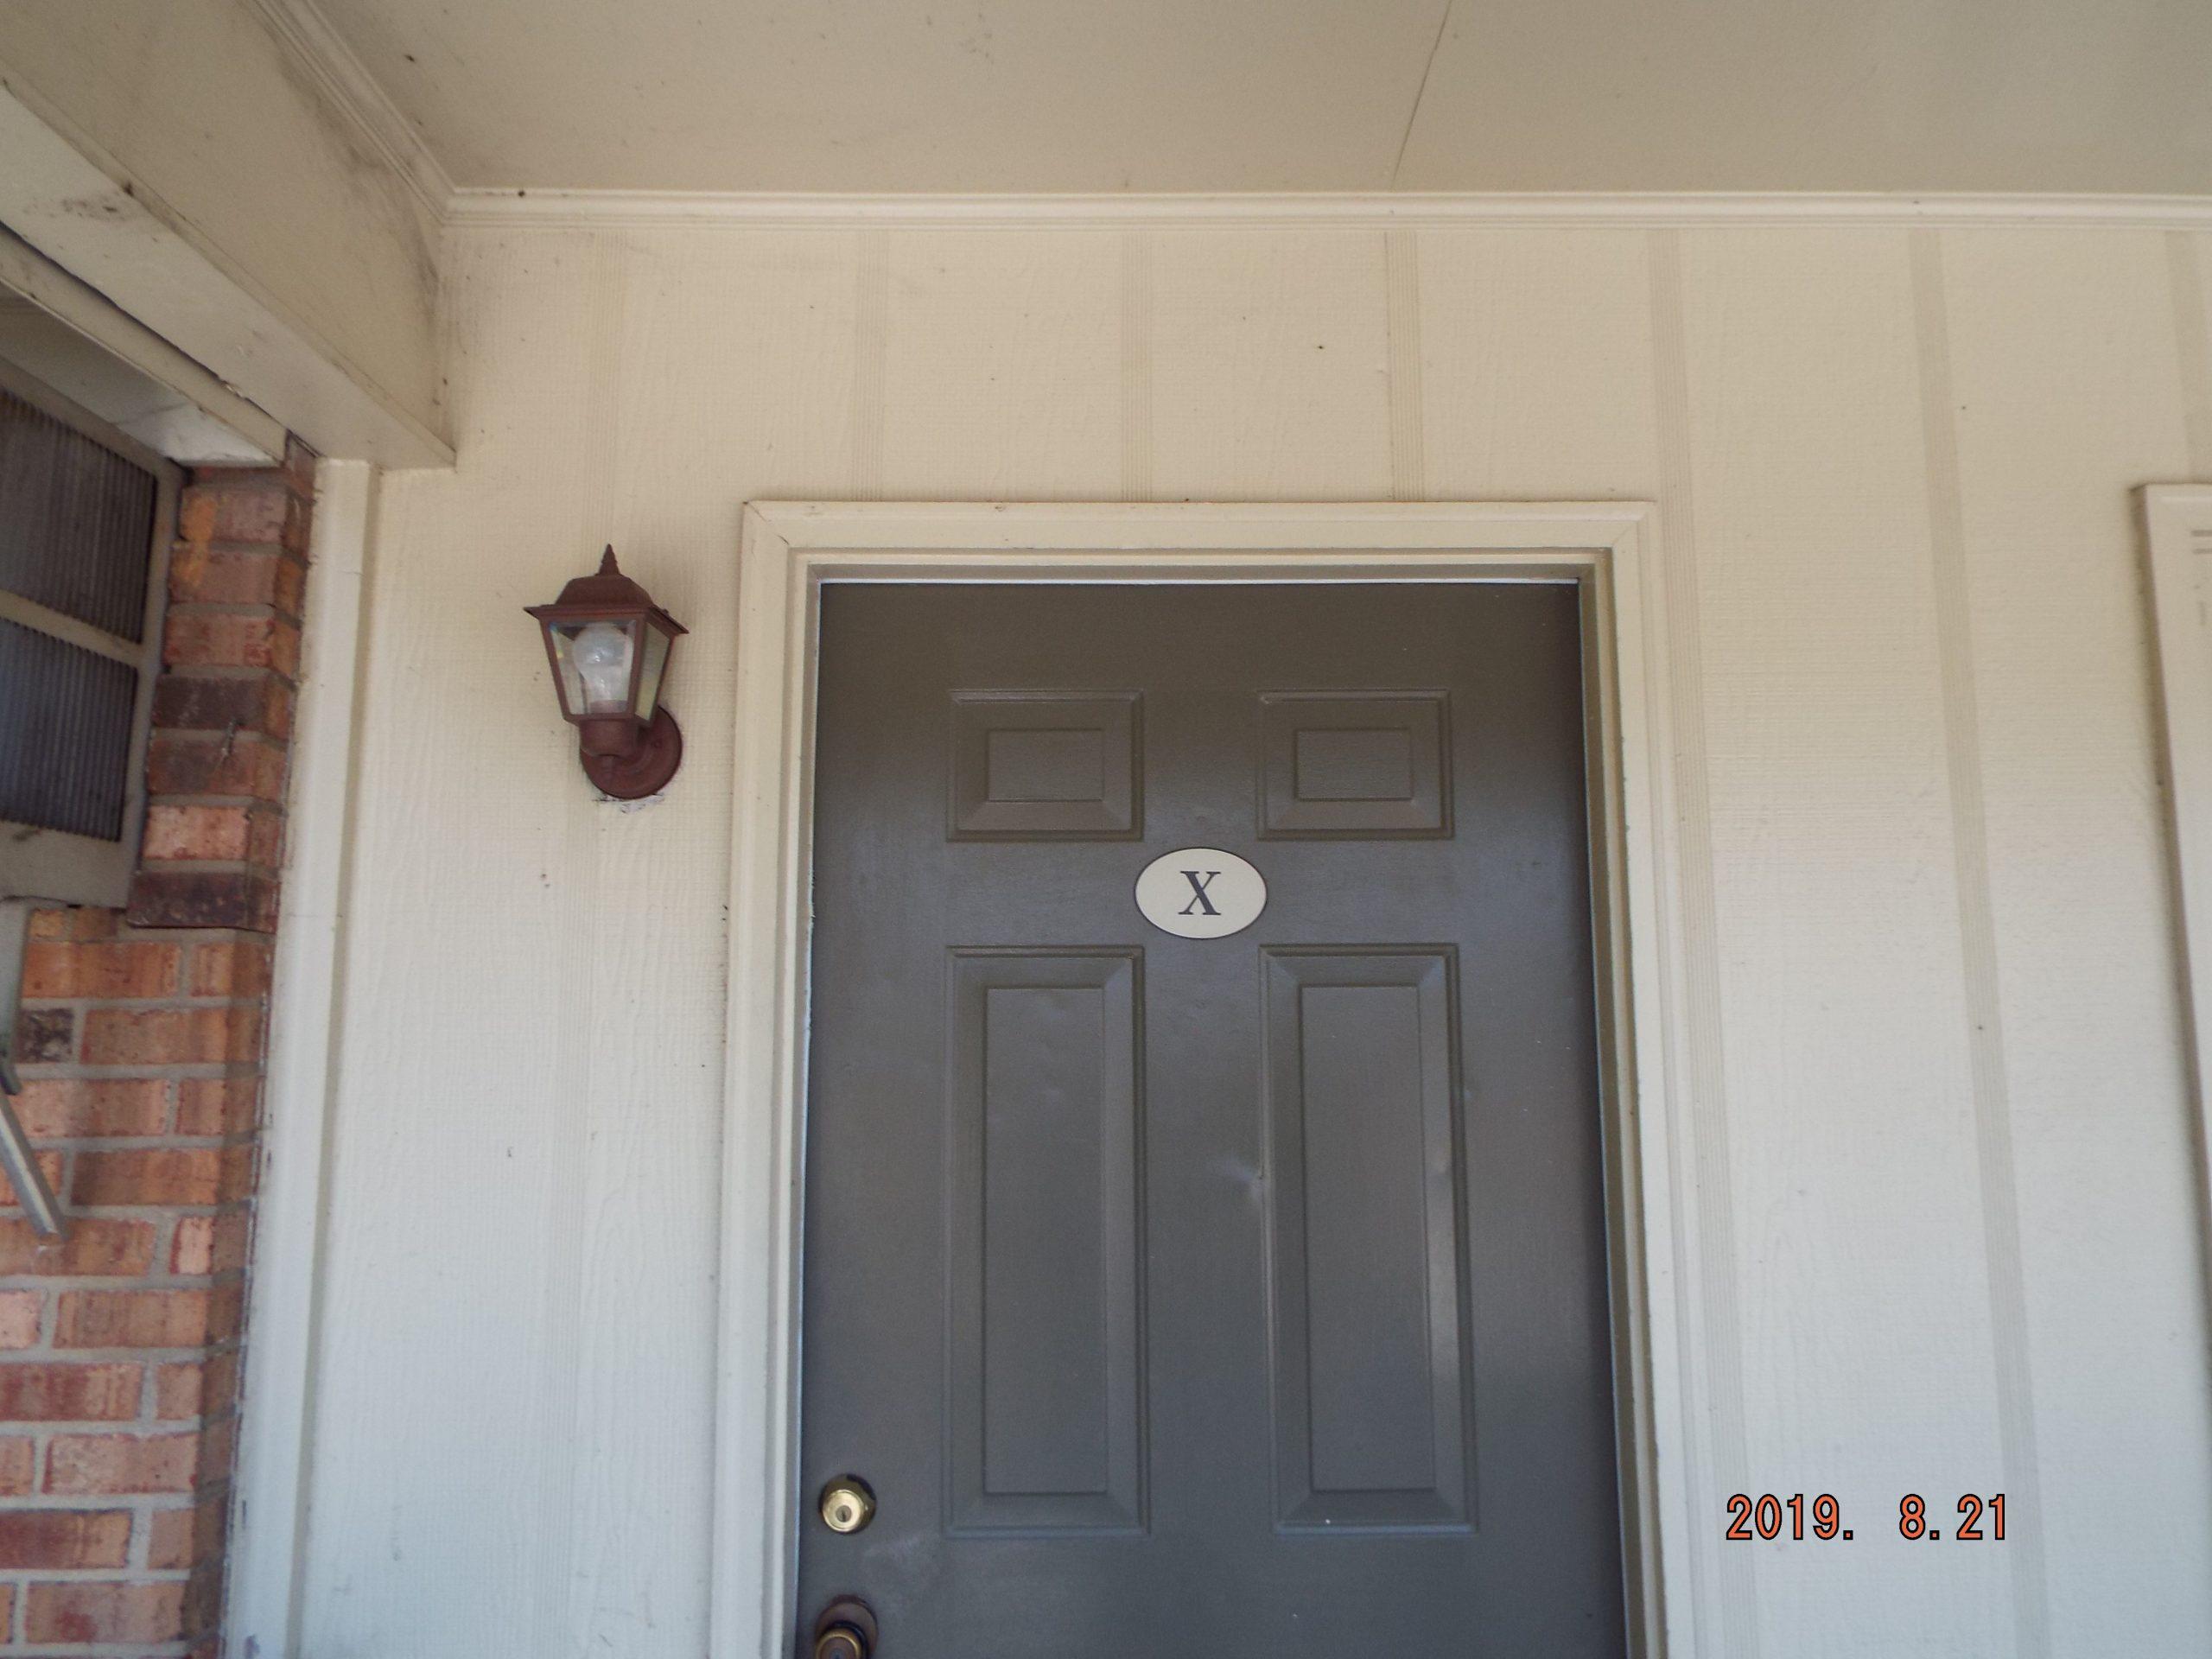 2220 N. Fayetteville St, Unit  X, Asheboro